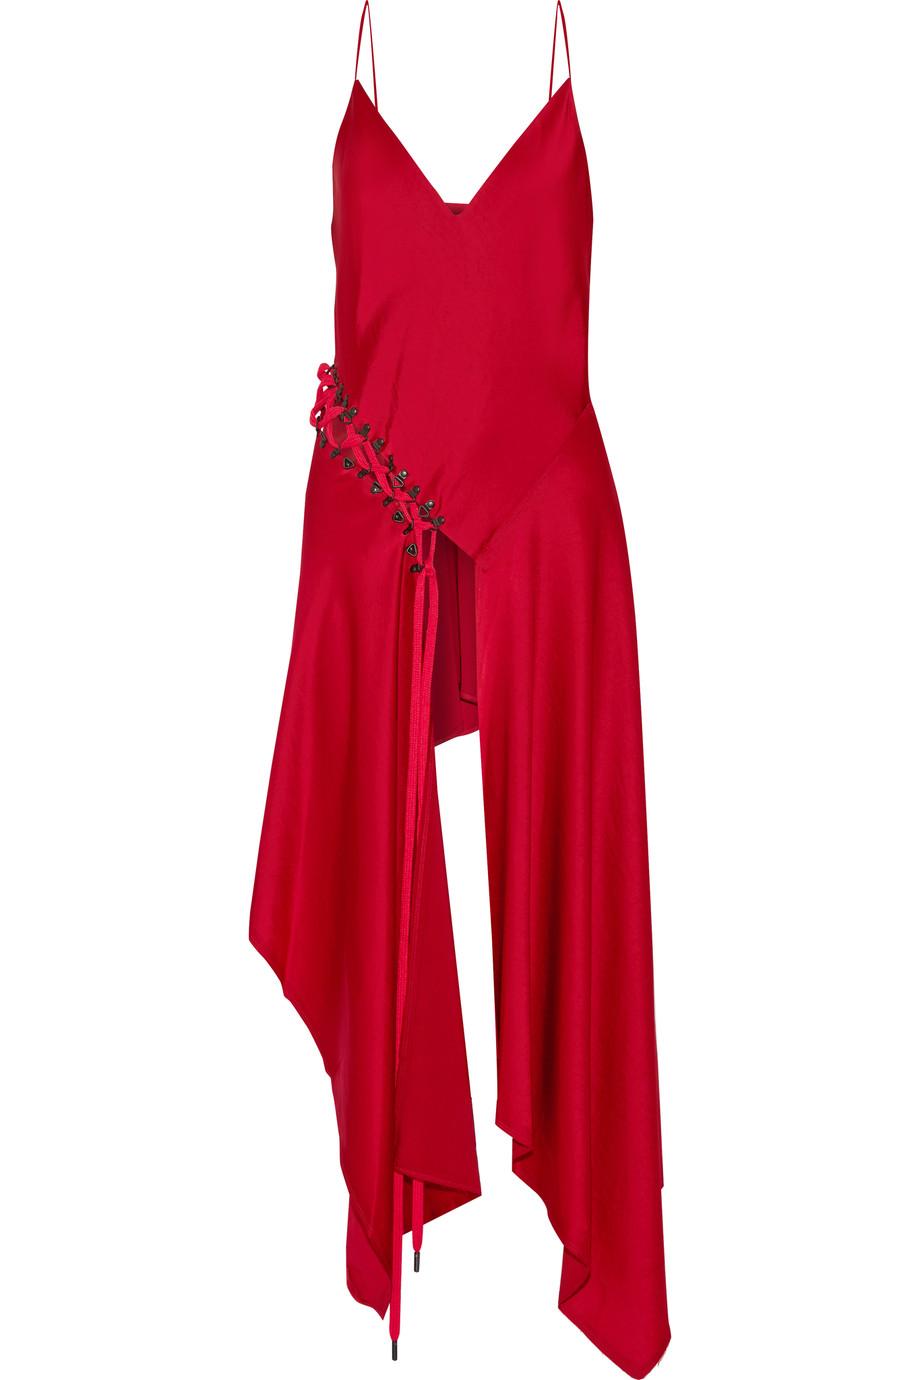 Wajib Punya: Pakaian dengan Detail Lace Up